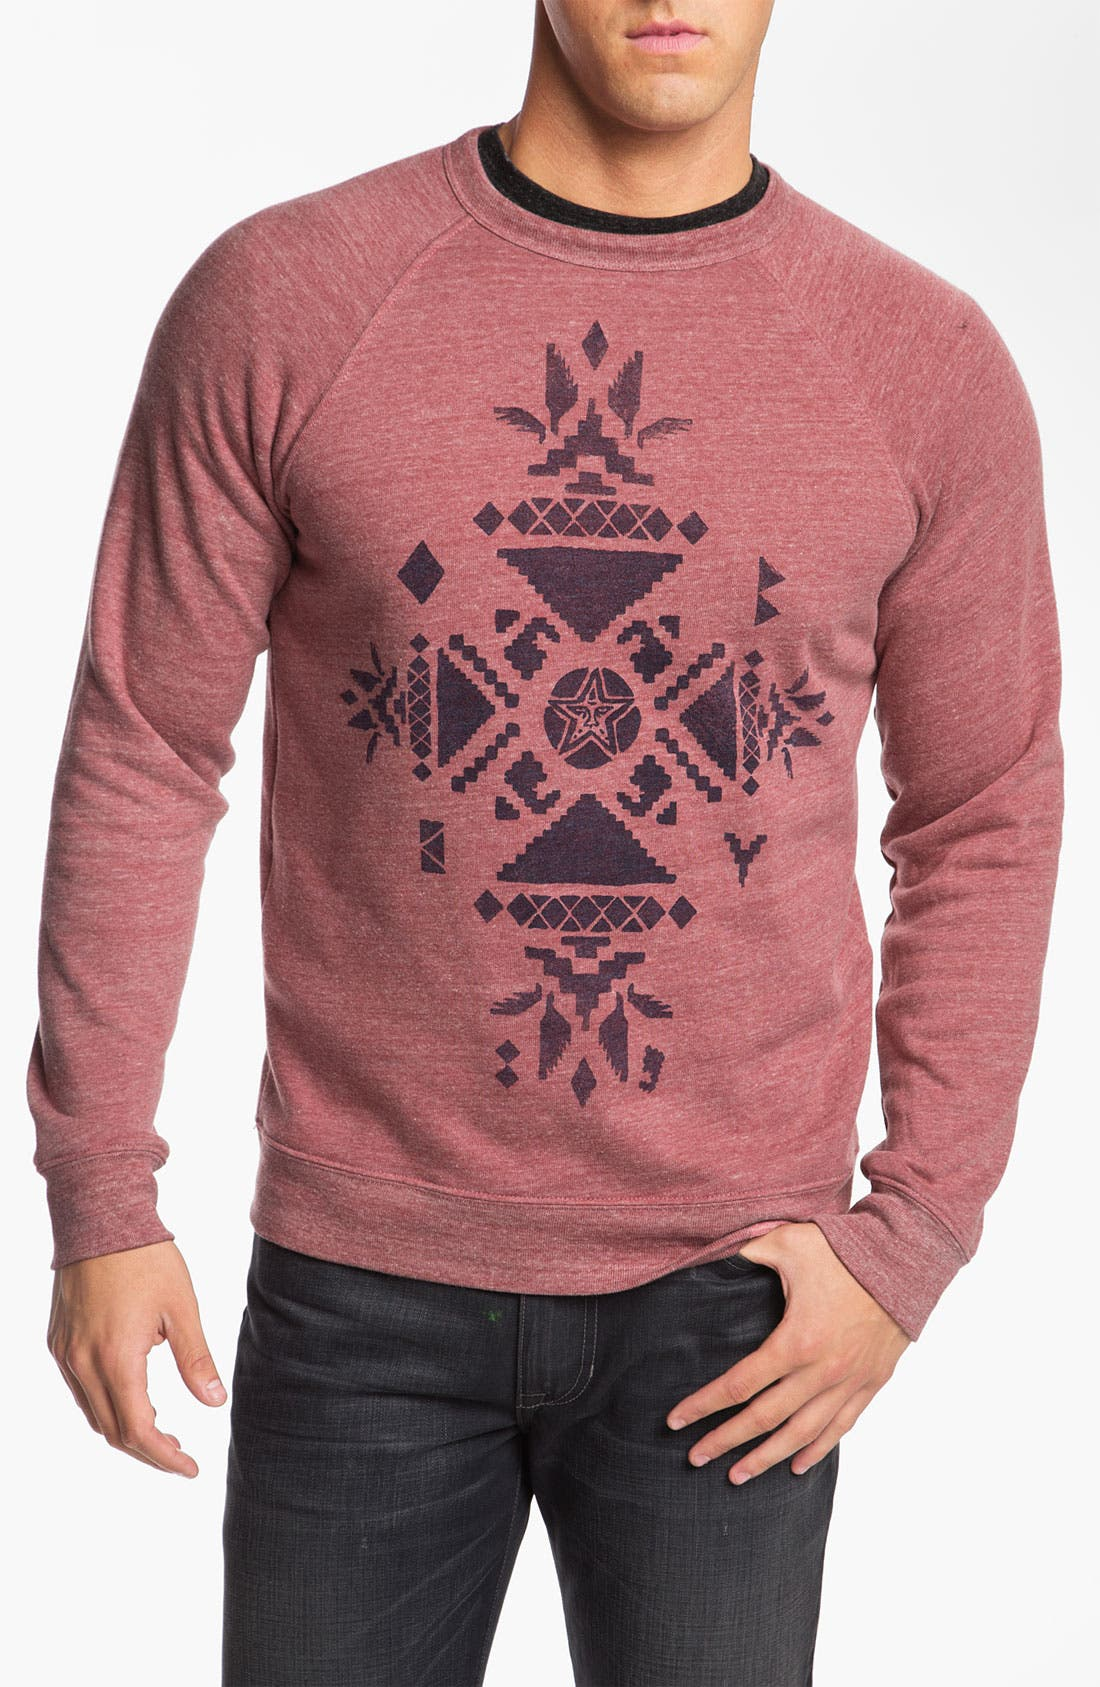 Main Image - Obey 'Desert Star' Graphic Crewneck Sweatshirt